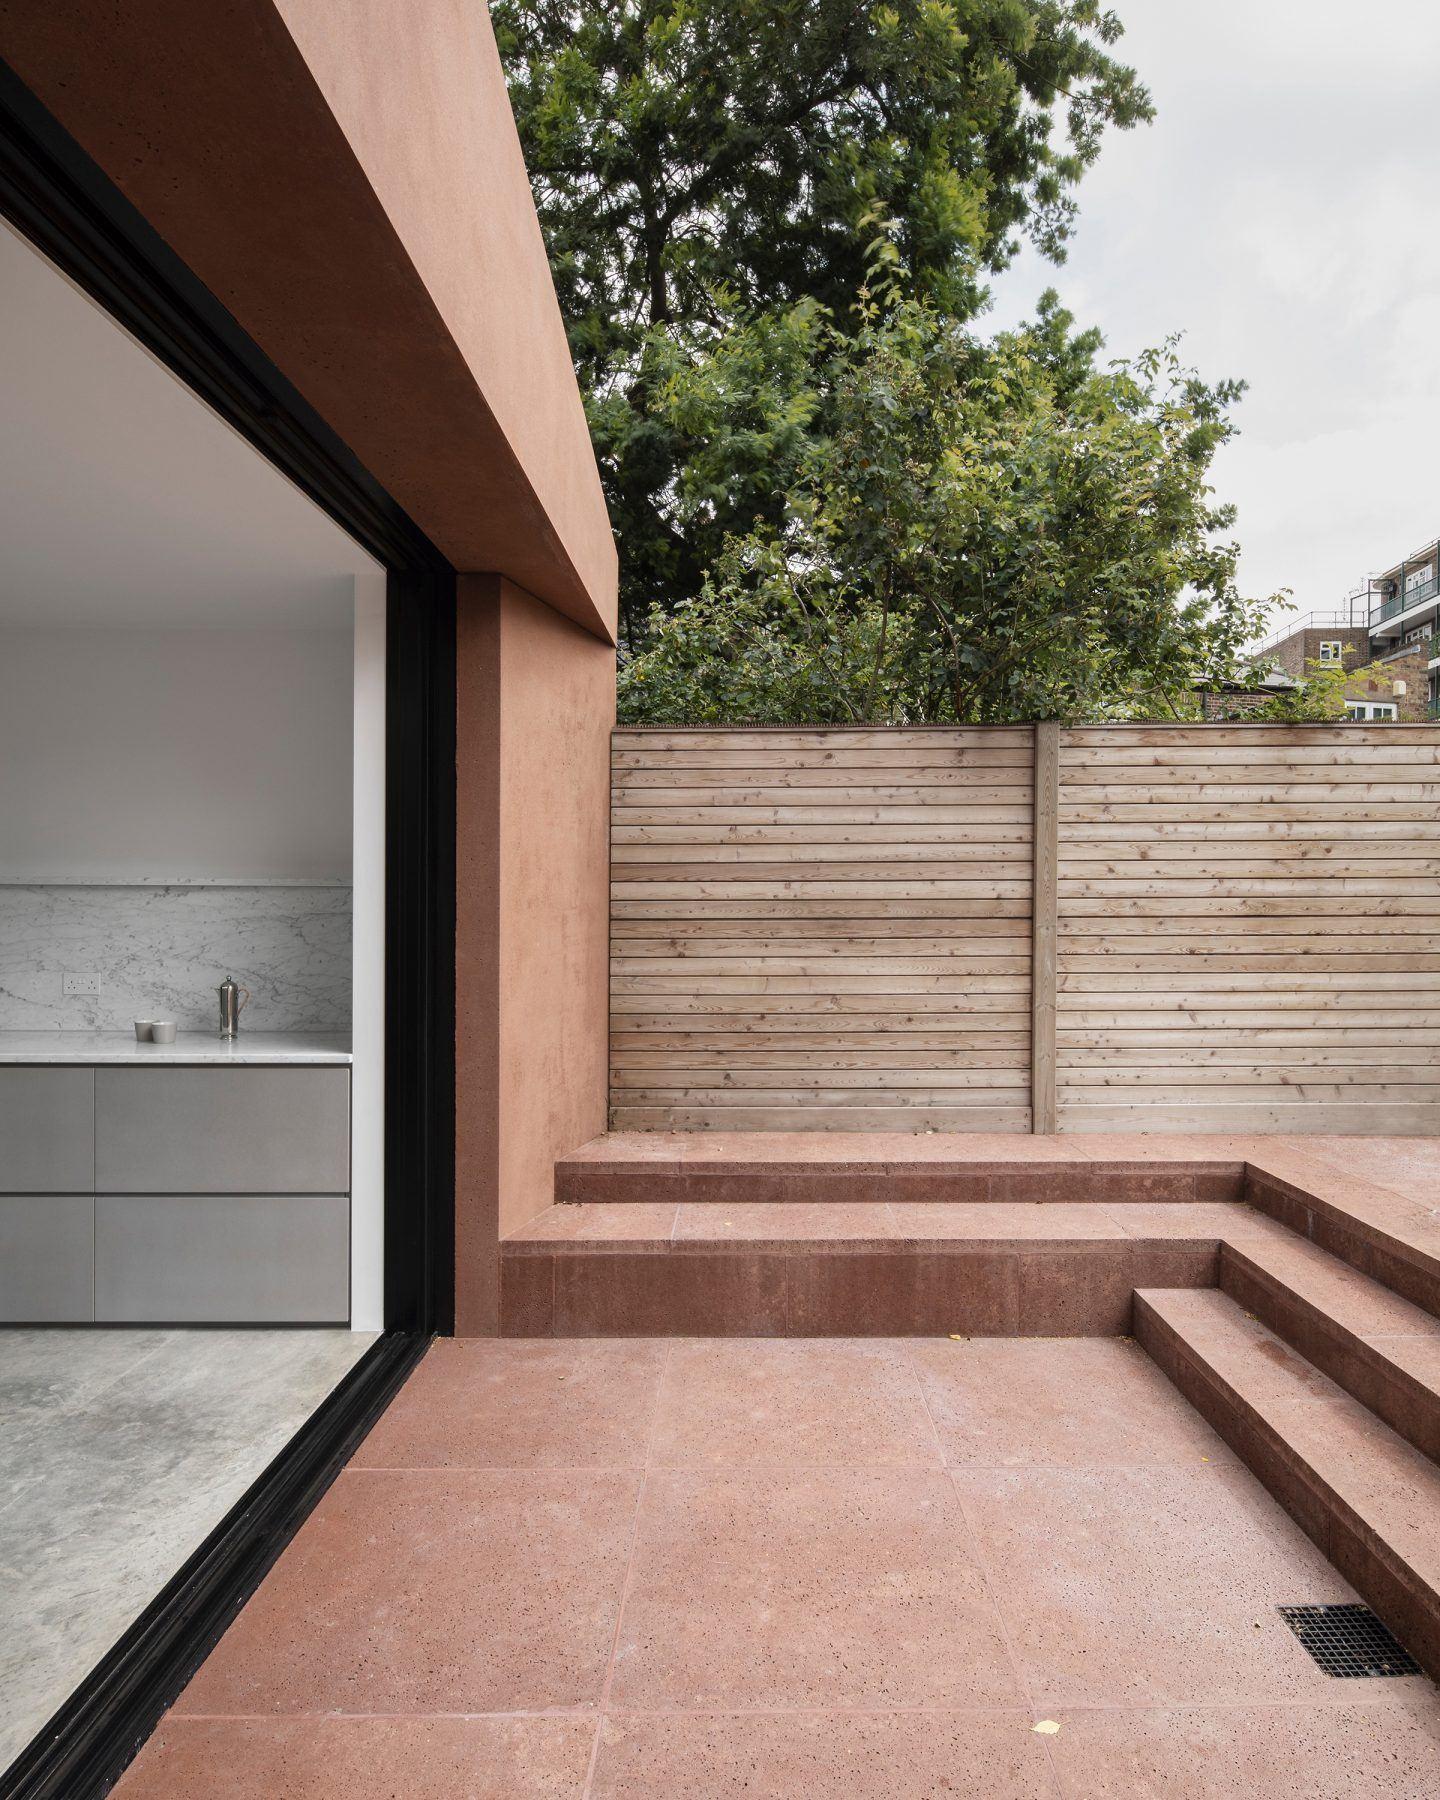 IGNANT-Architecture-Al-Jawad-Pike-Elsley-Road-2